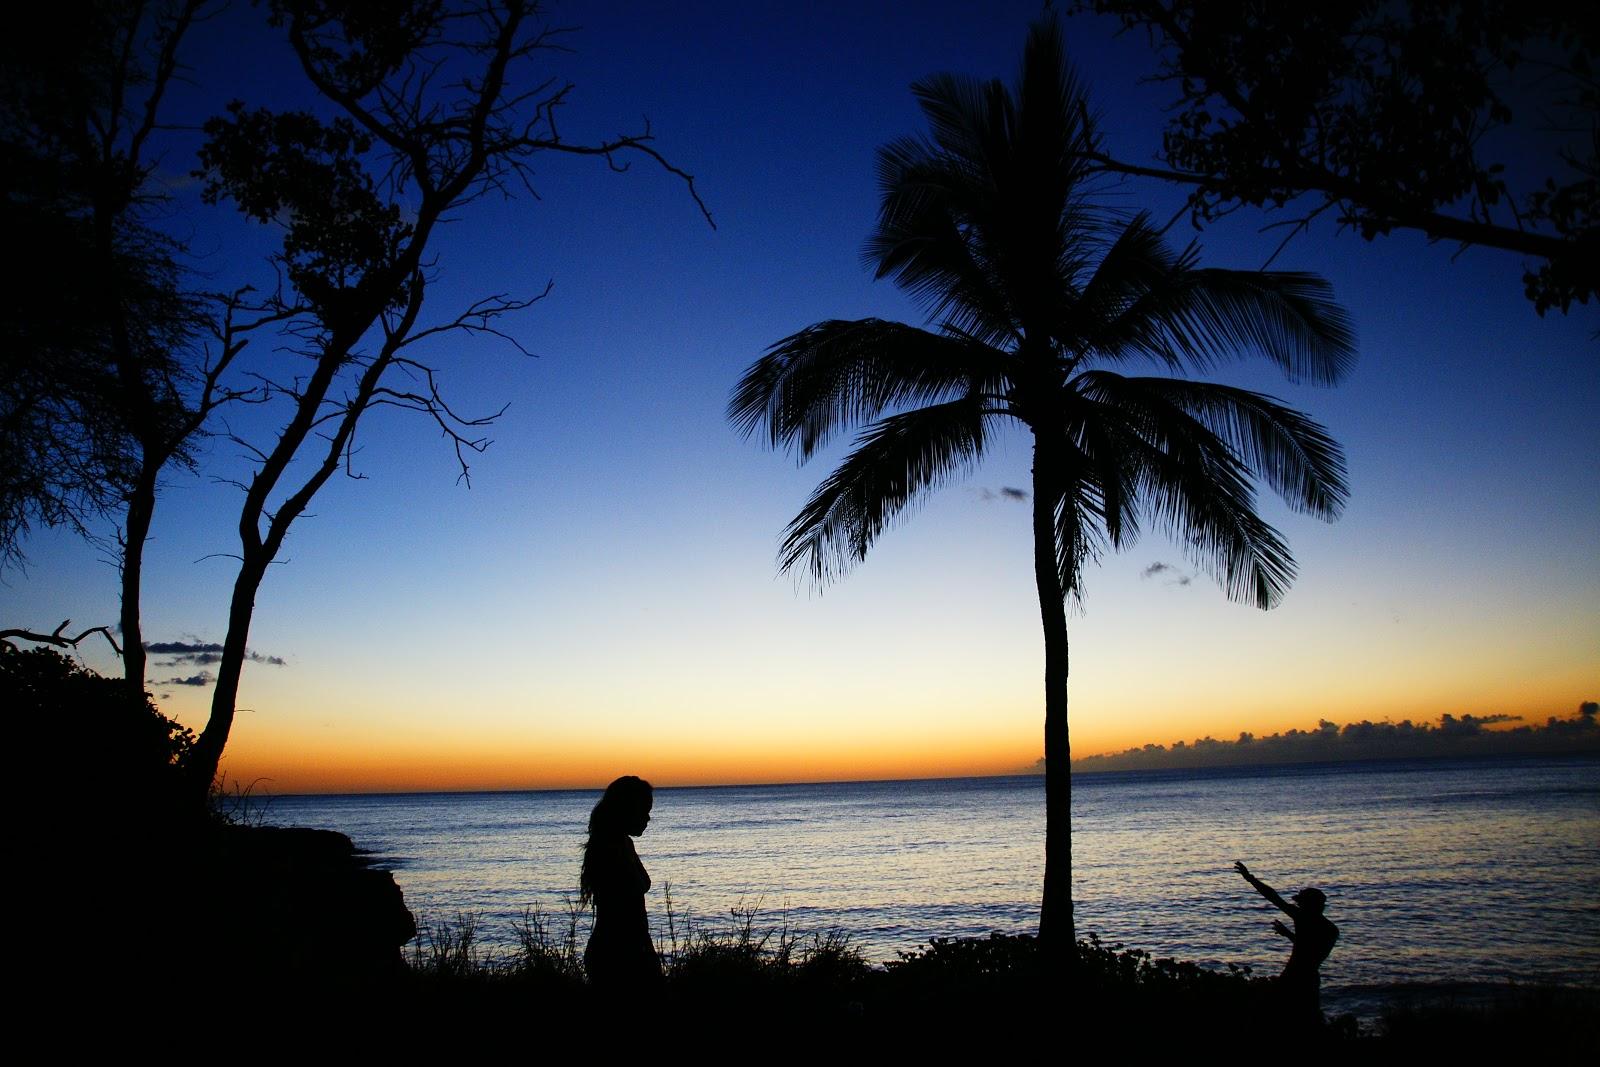 Dgc S Hawaii Hiking Tales 8 25 2012 Lahilahi Black Rock